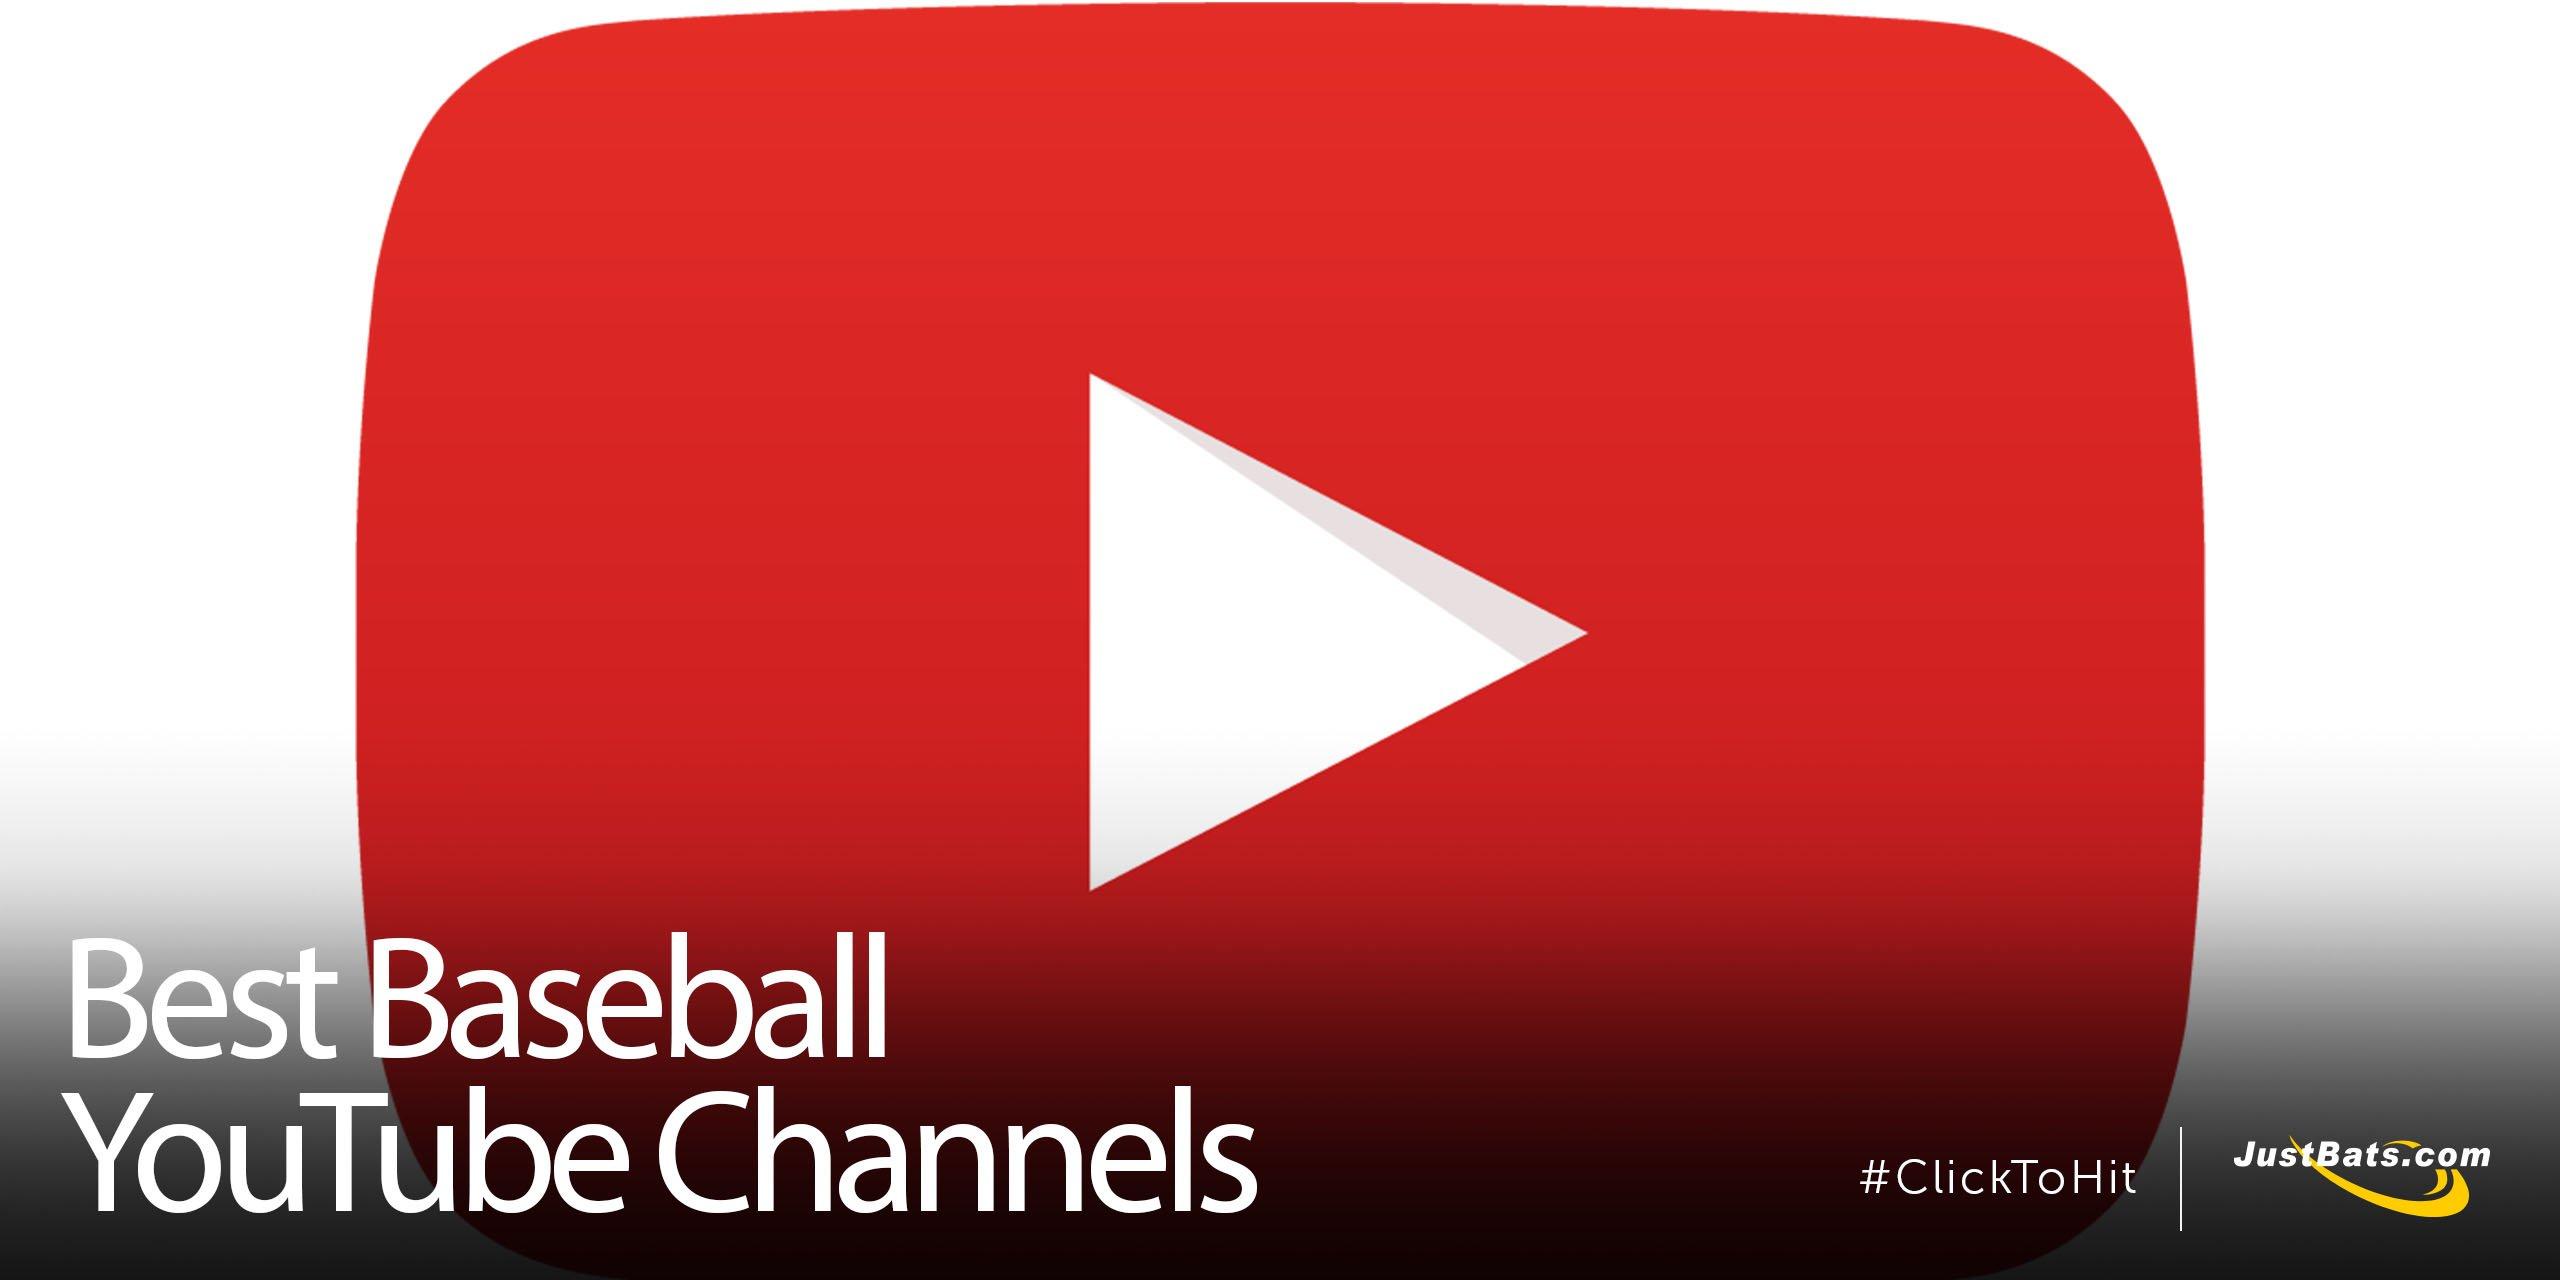 YouTube Channels - Blog.jpg